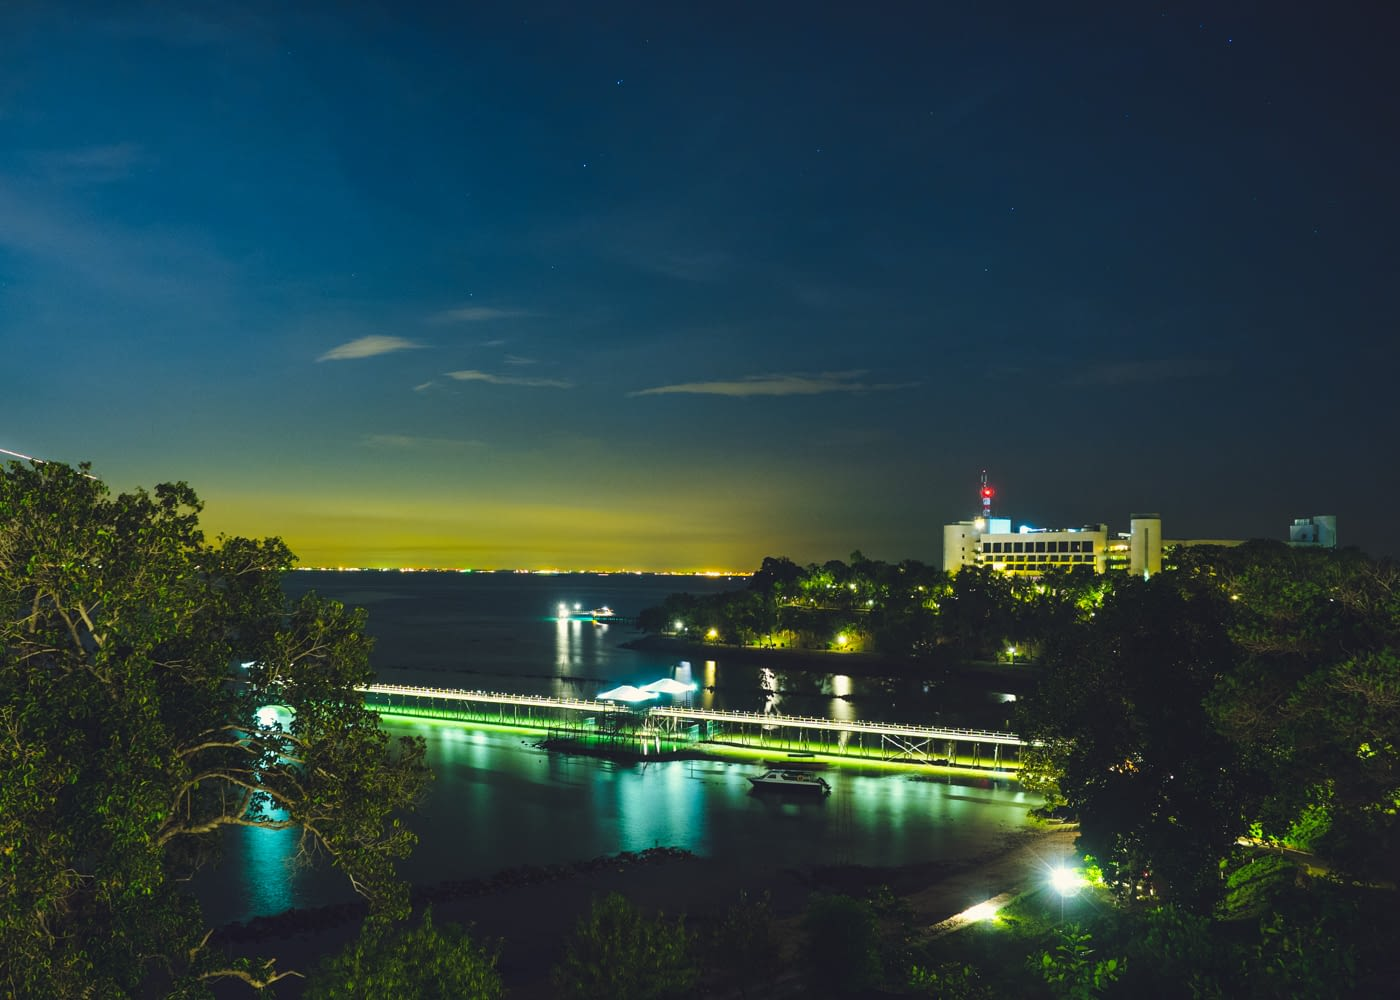 Indonesia - Montigo - Night view of the bridge and sea